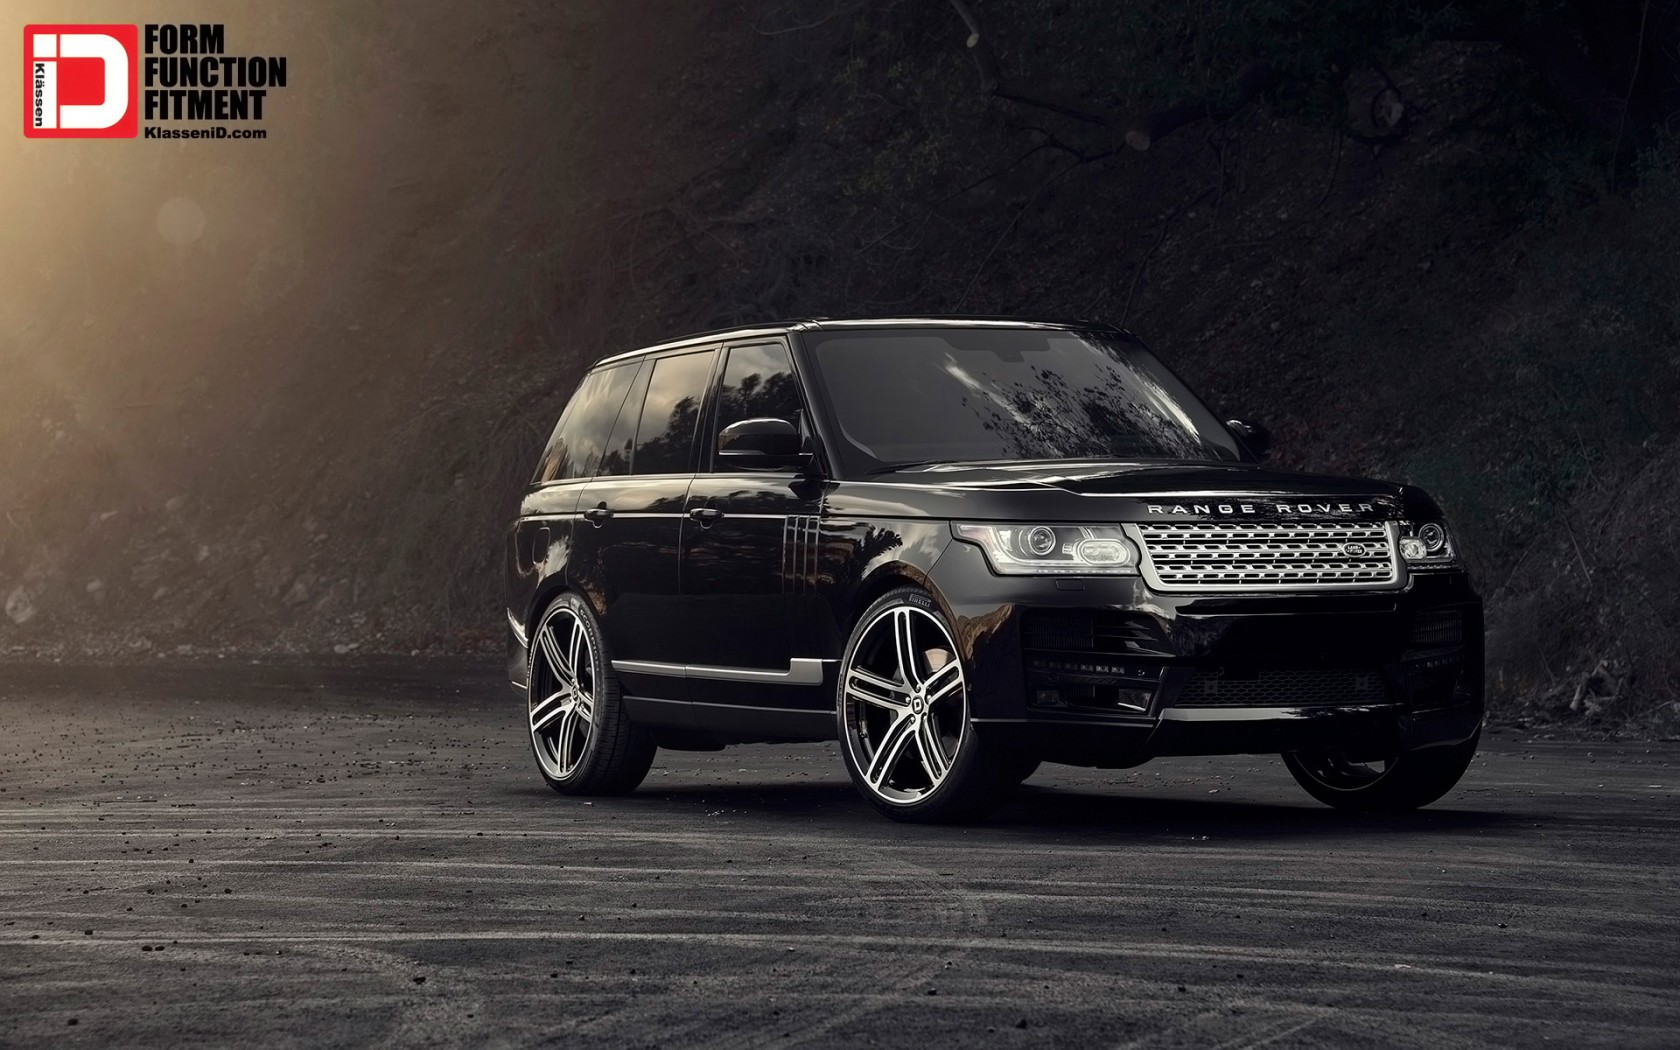 2015 Klassen Range Rover Piano Black M50Q Wheels Wallpaper